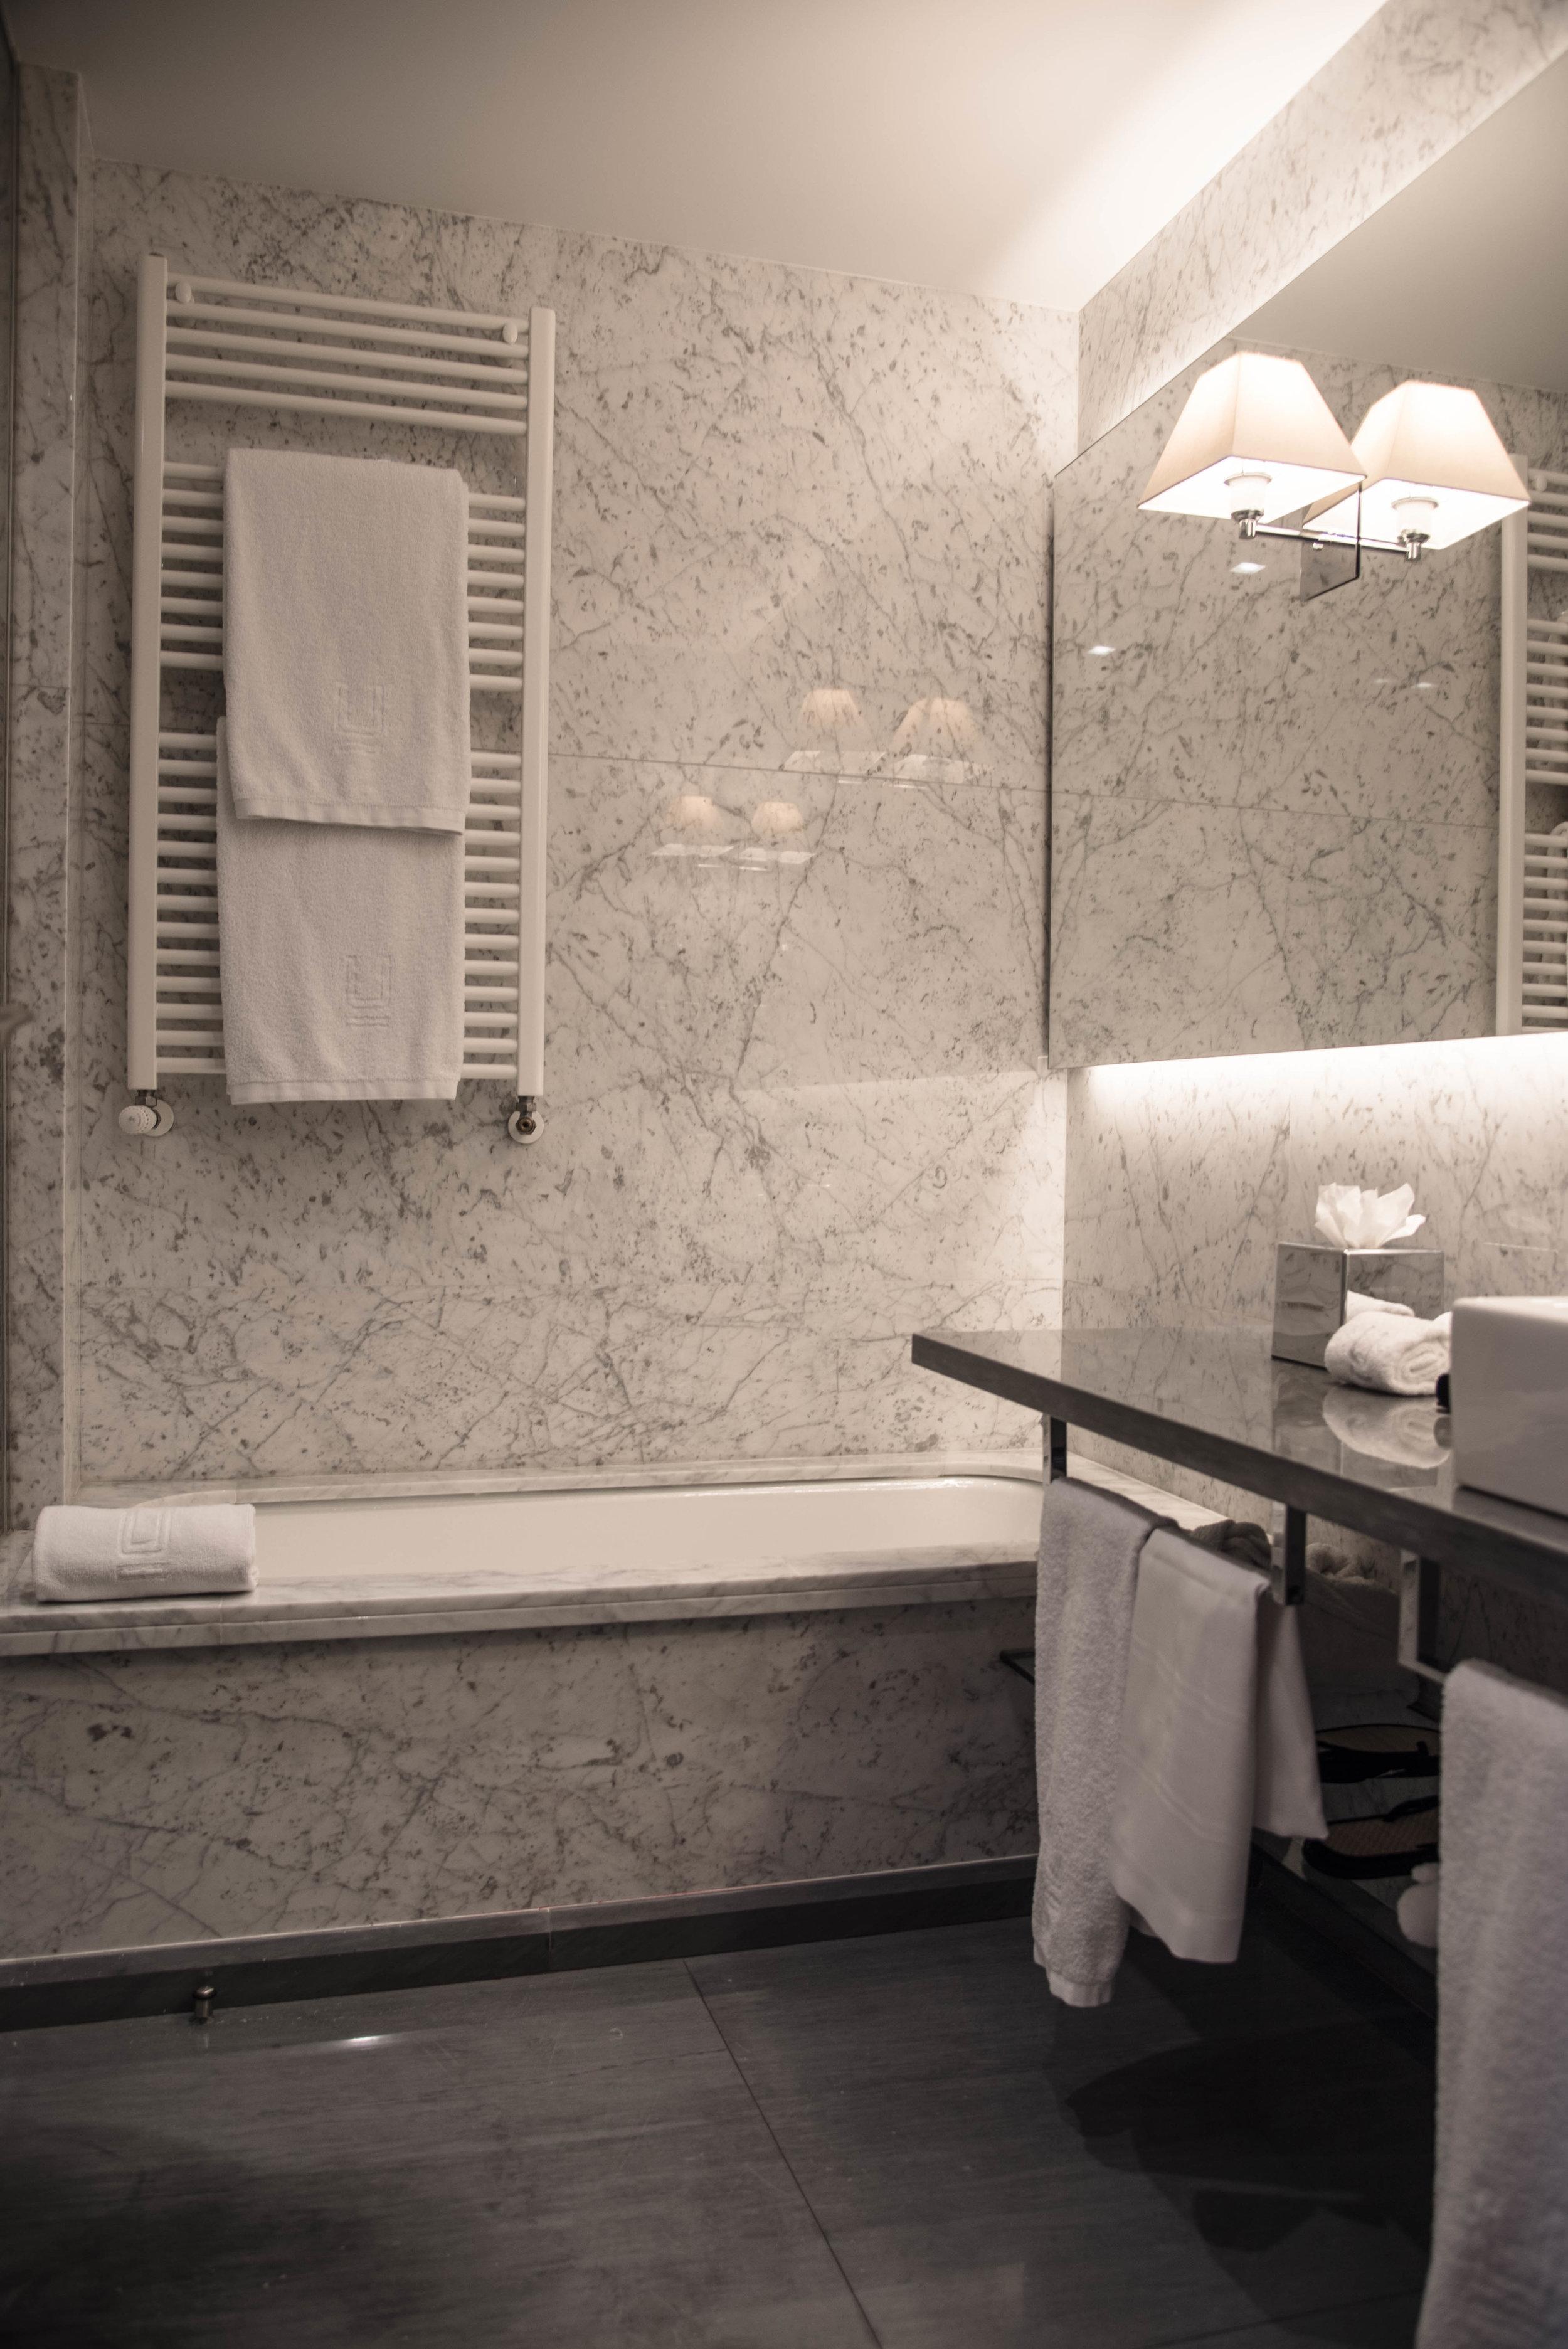 ROSE & IVY Journal Escape | Hotel Urso, Madrid